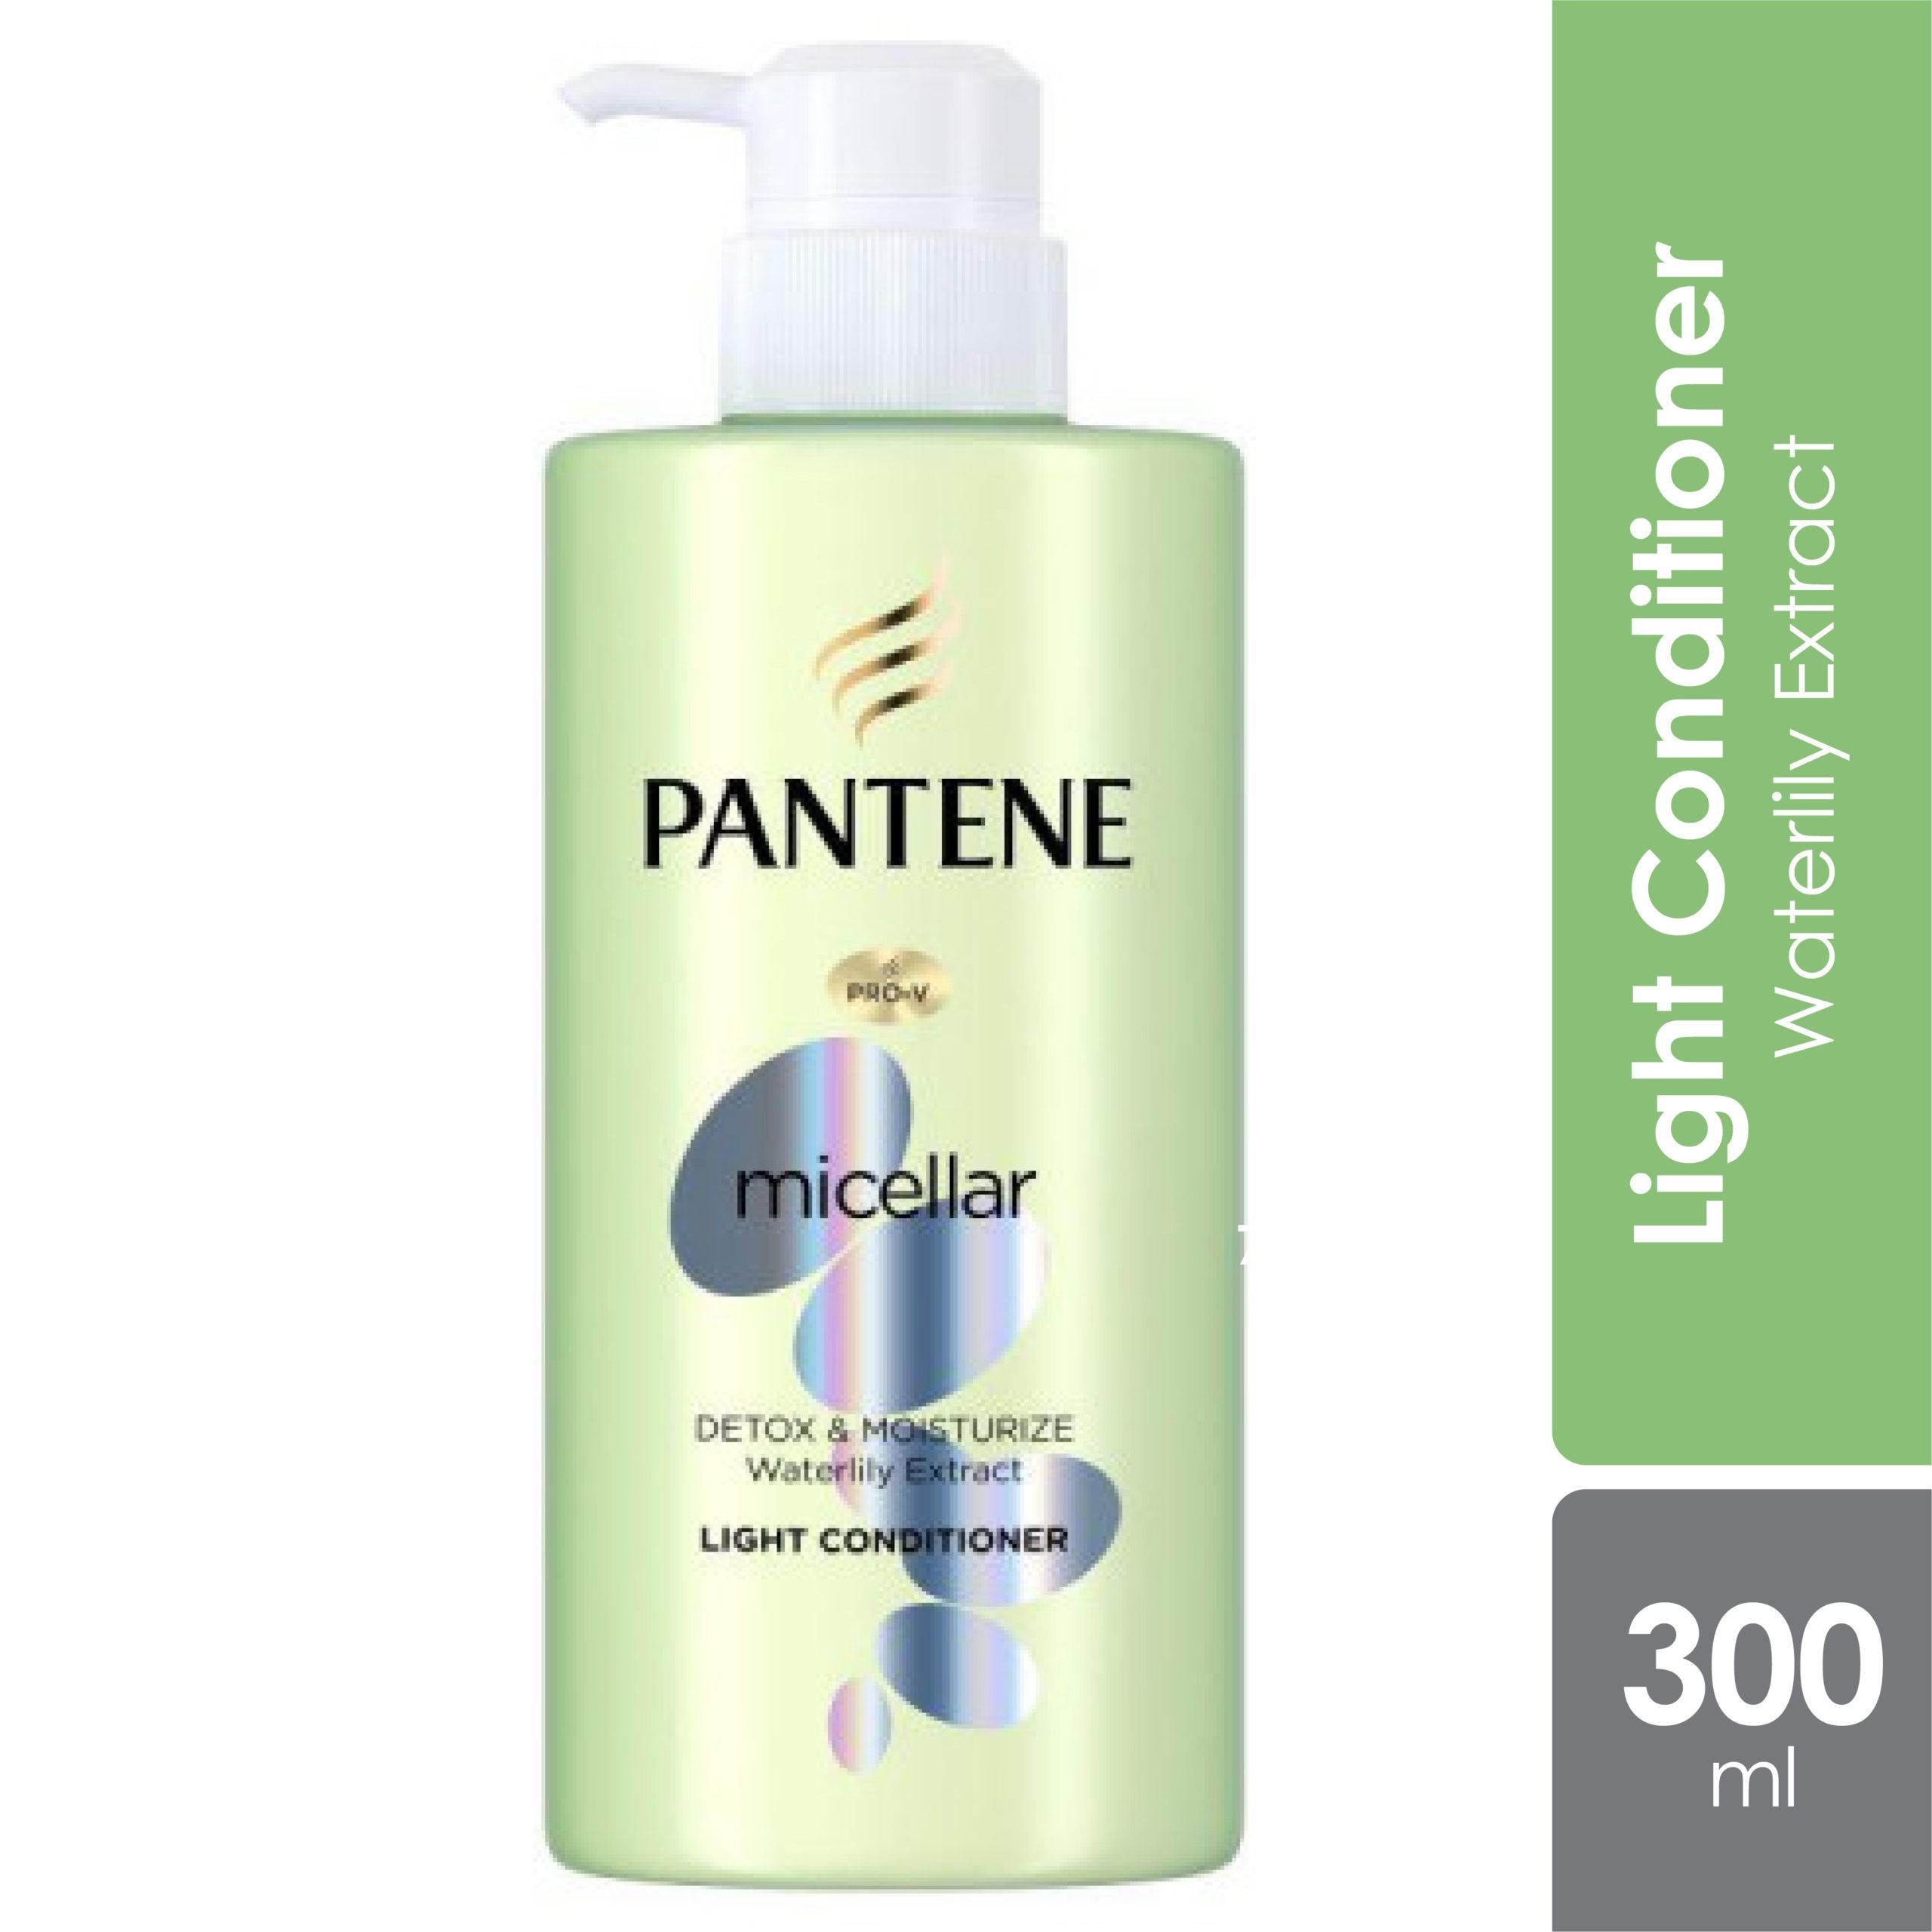 Pantene Micellar Detox & Moisturize Shampoo 300ml